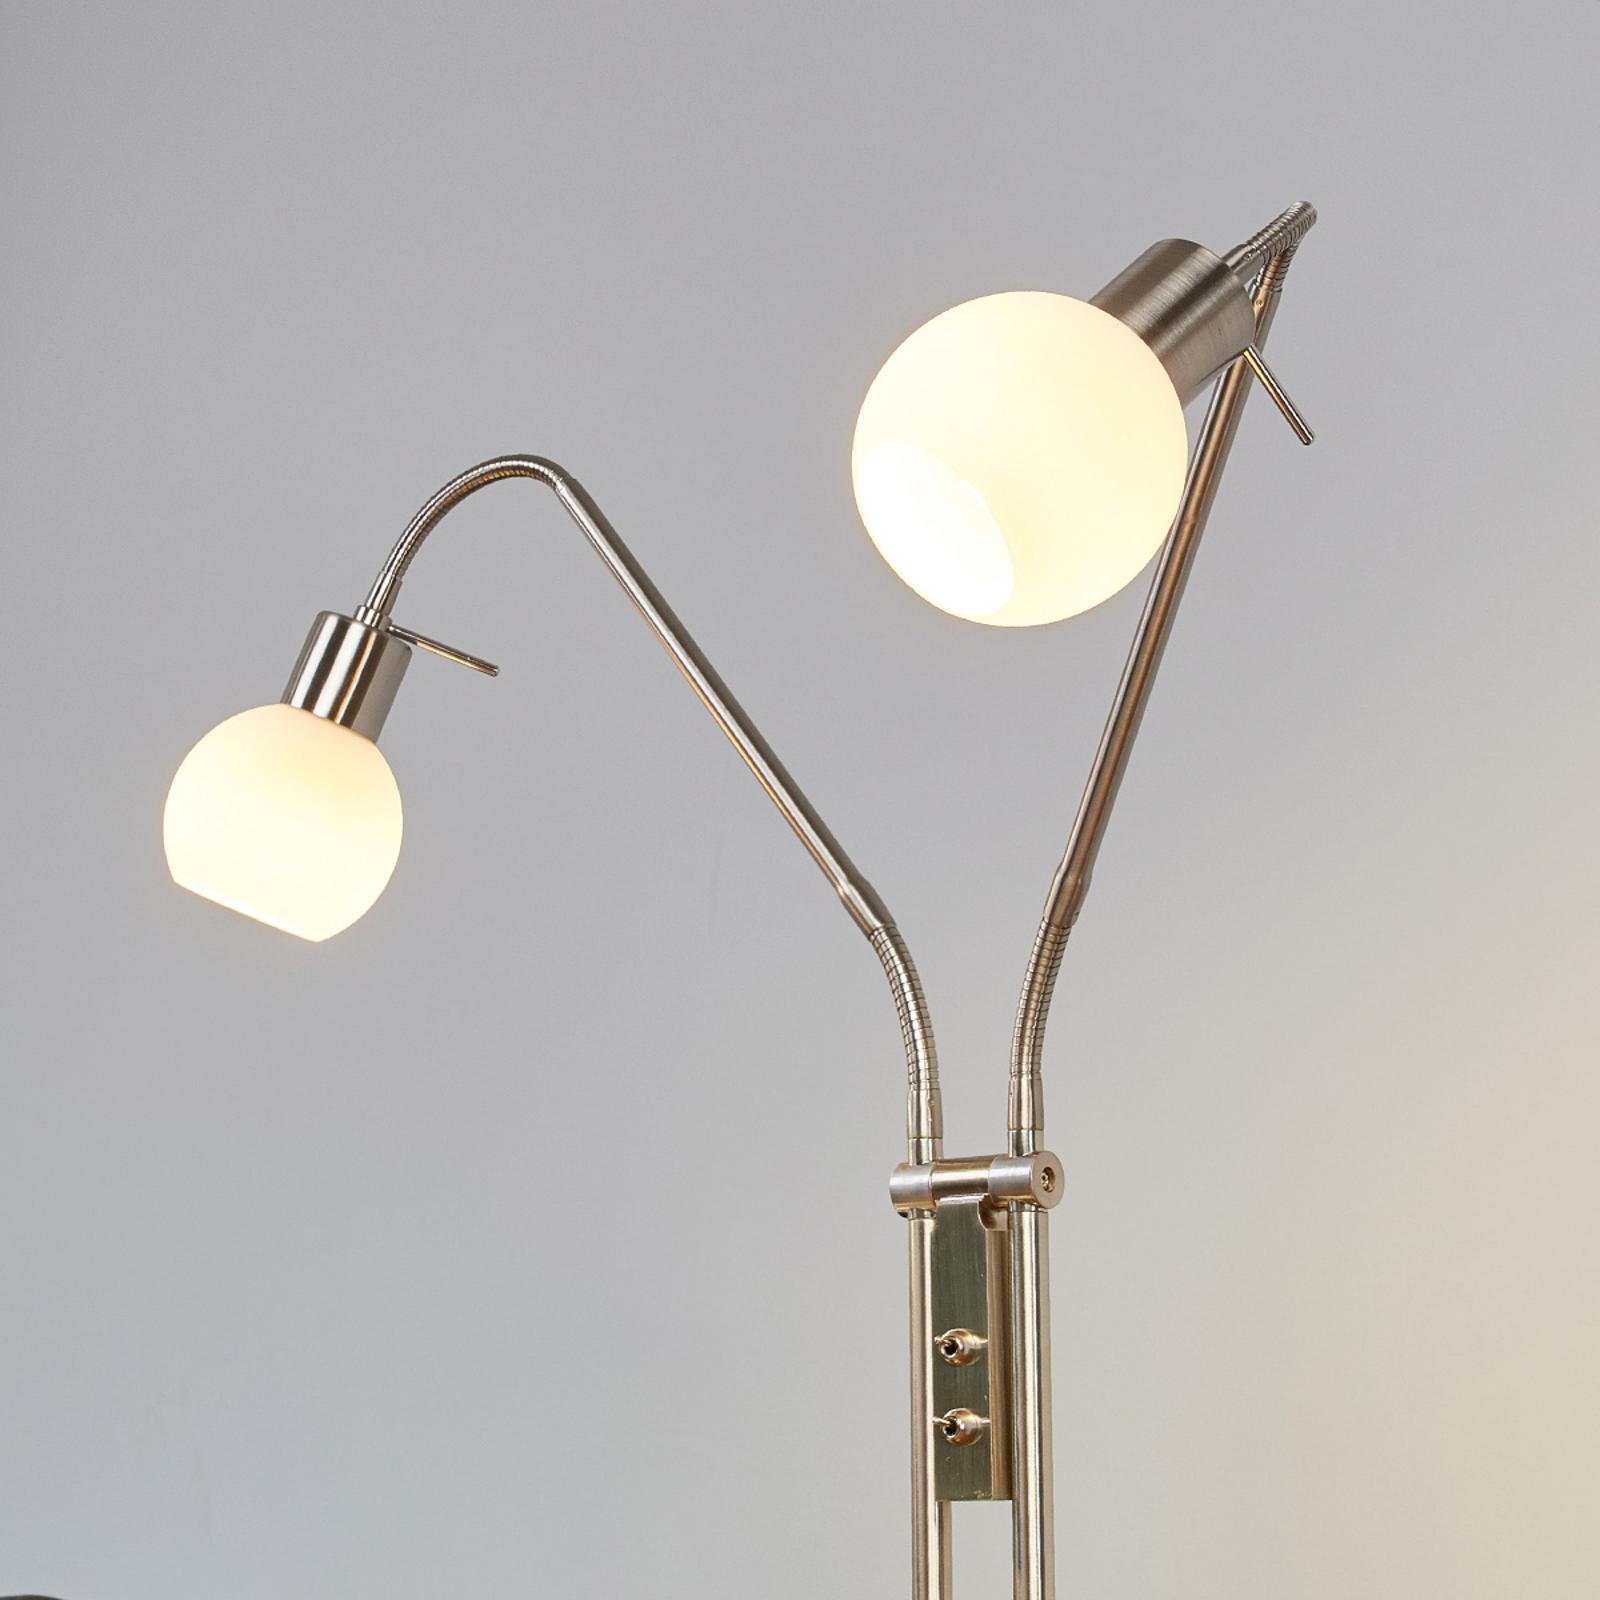 Lampadaire LED Elaina à 2lampes, nickel mat